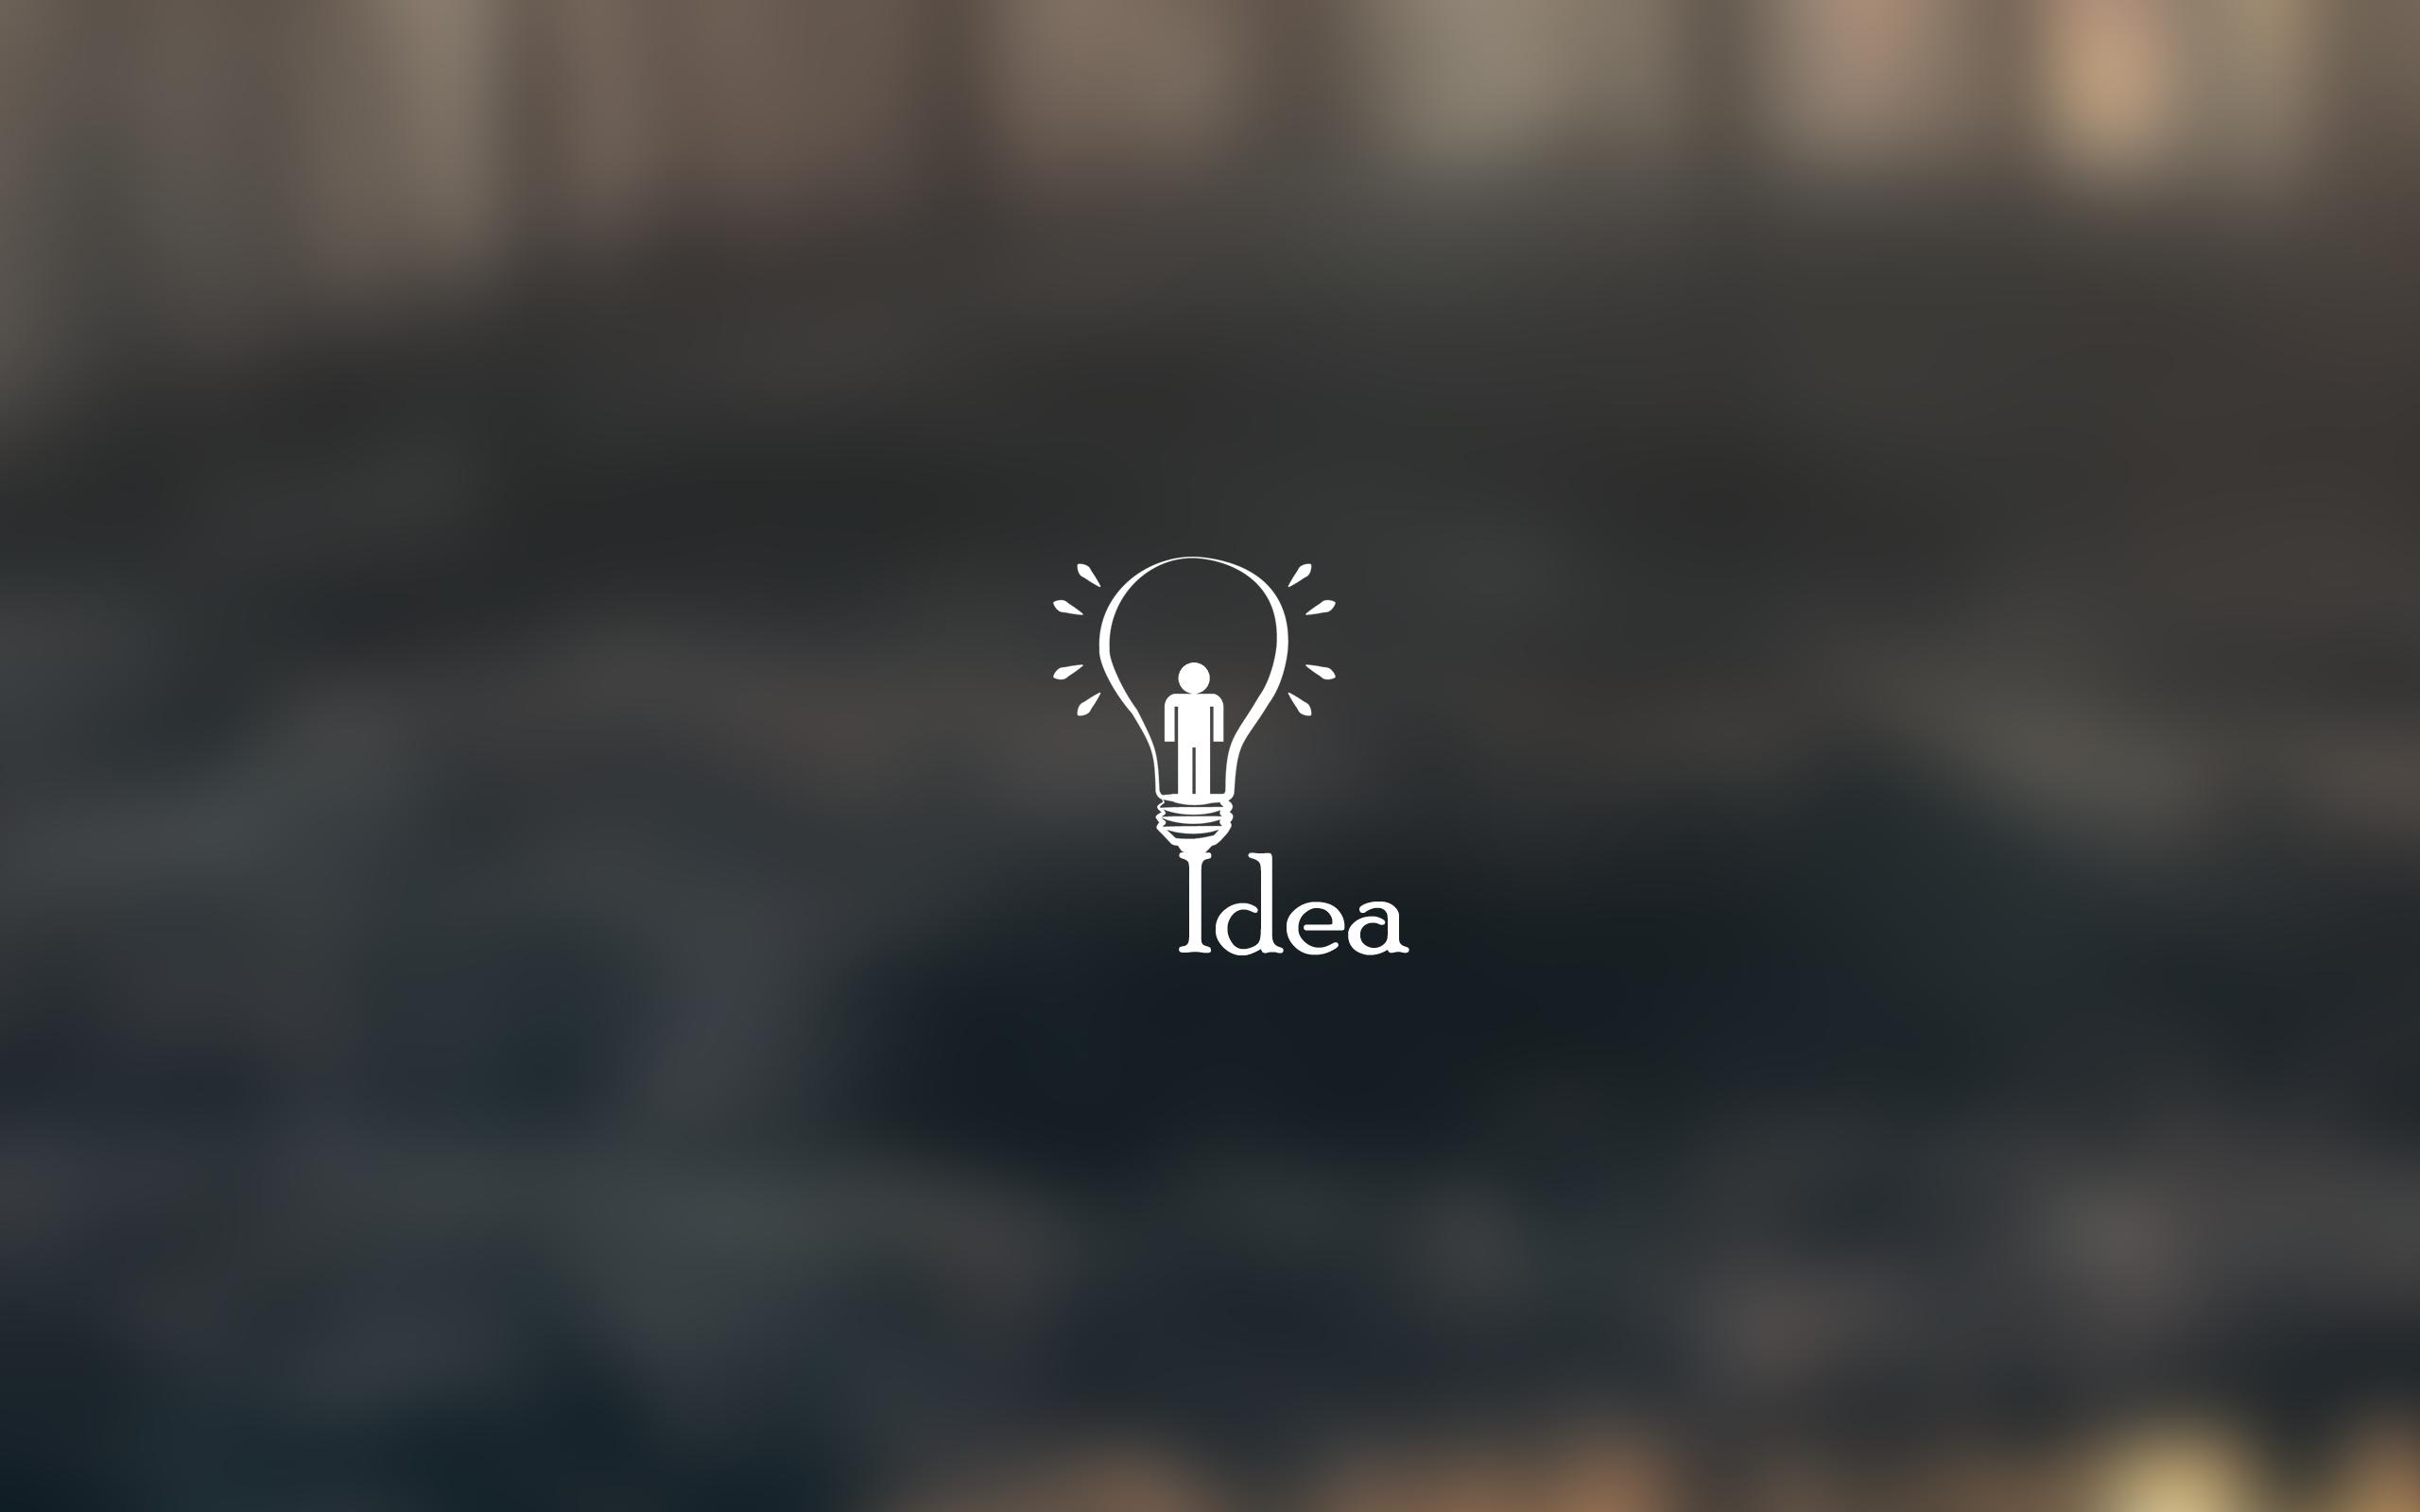 idea typography hd 4k wallpapers